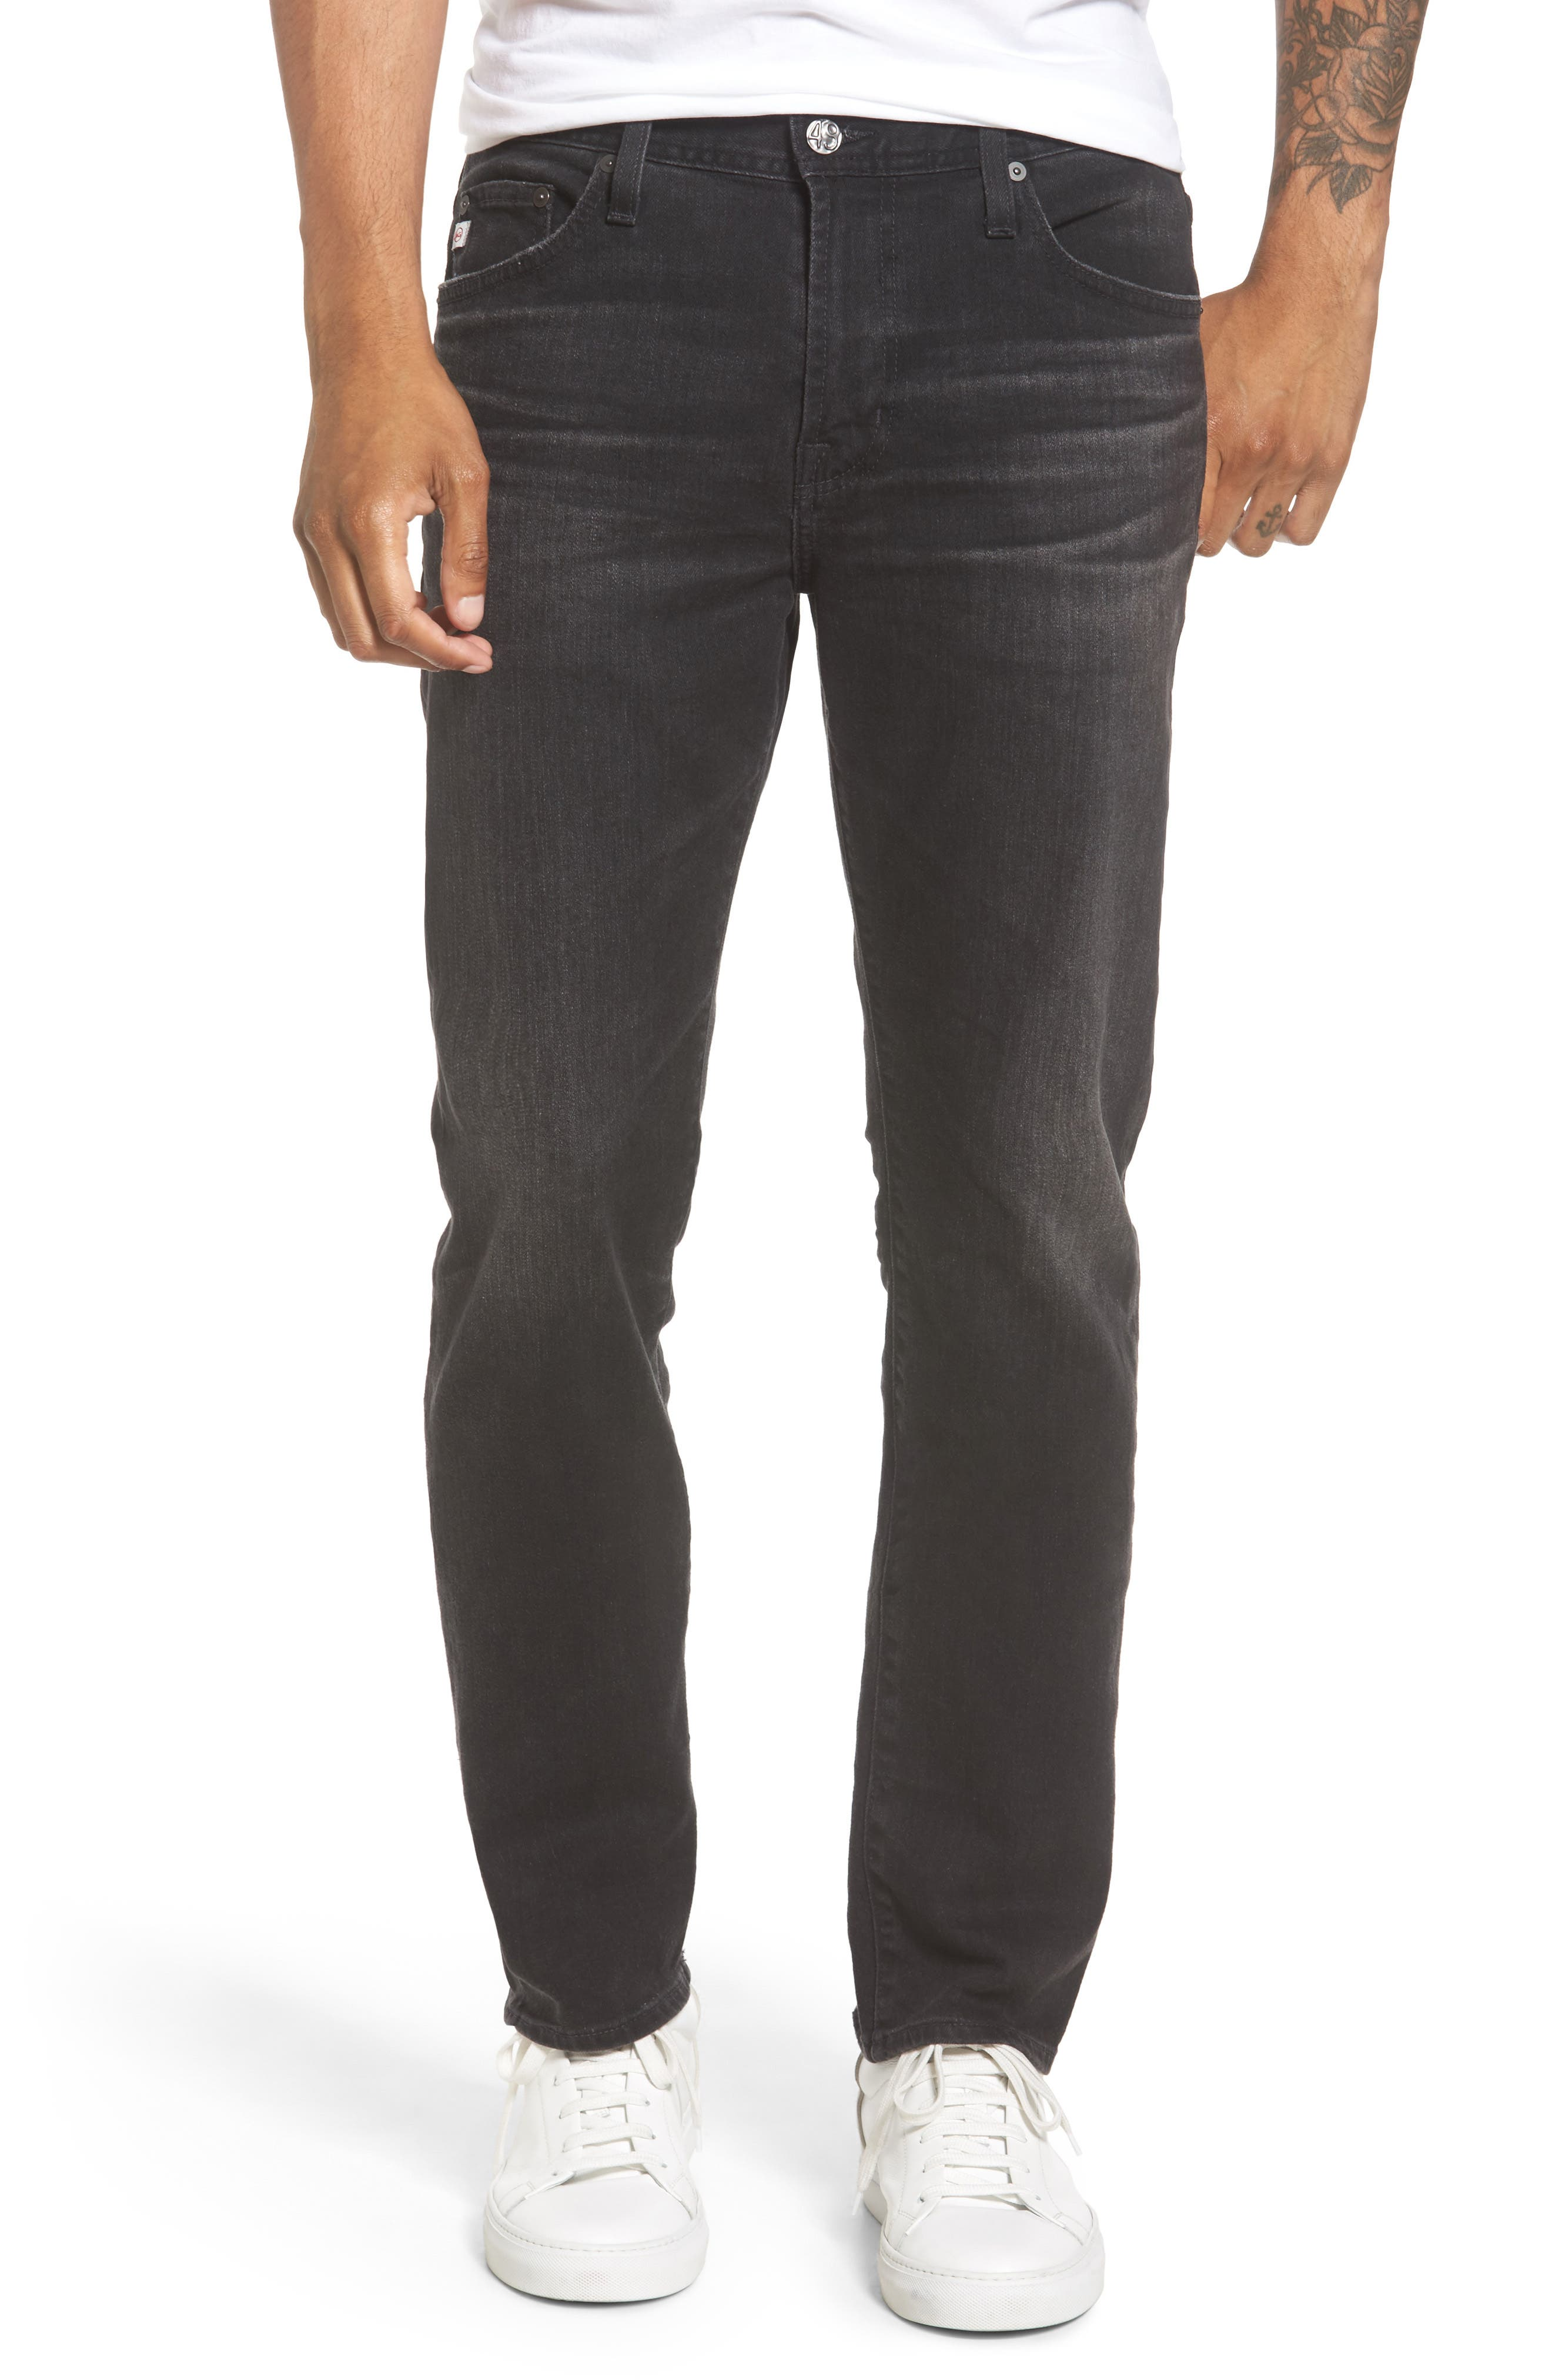 Main Image - AG Everett Slim Straight Leg Jeans (4 Years Down)